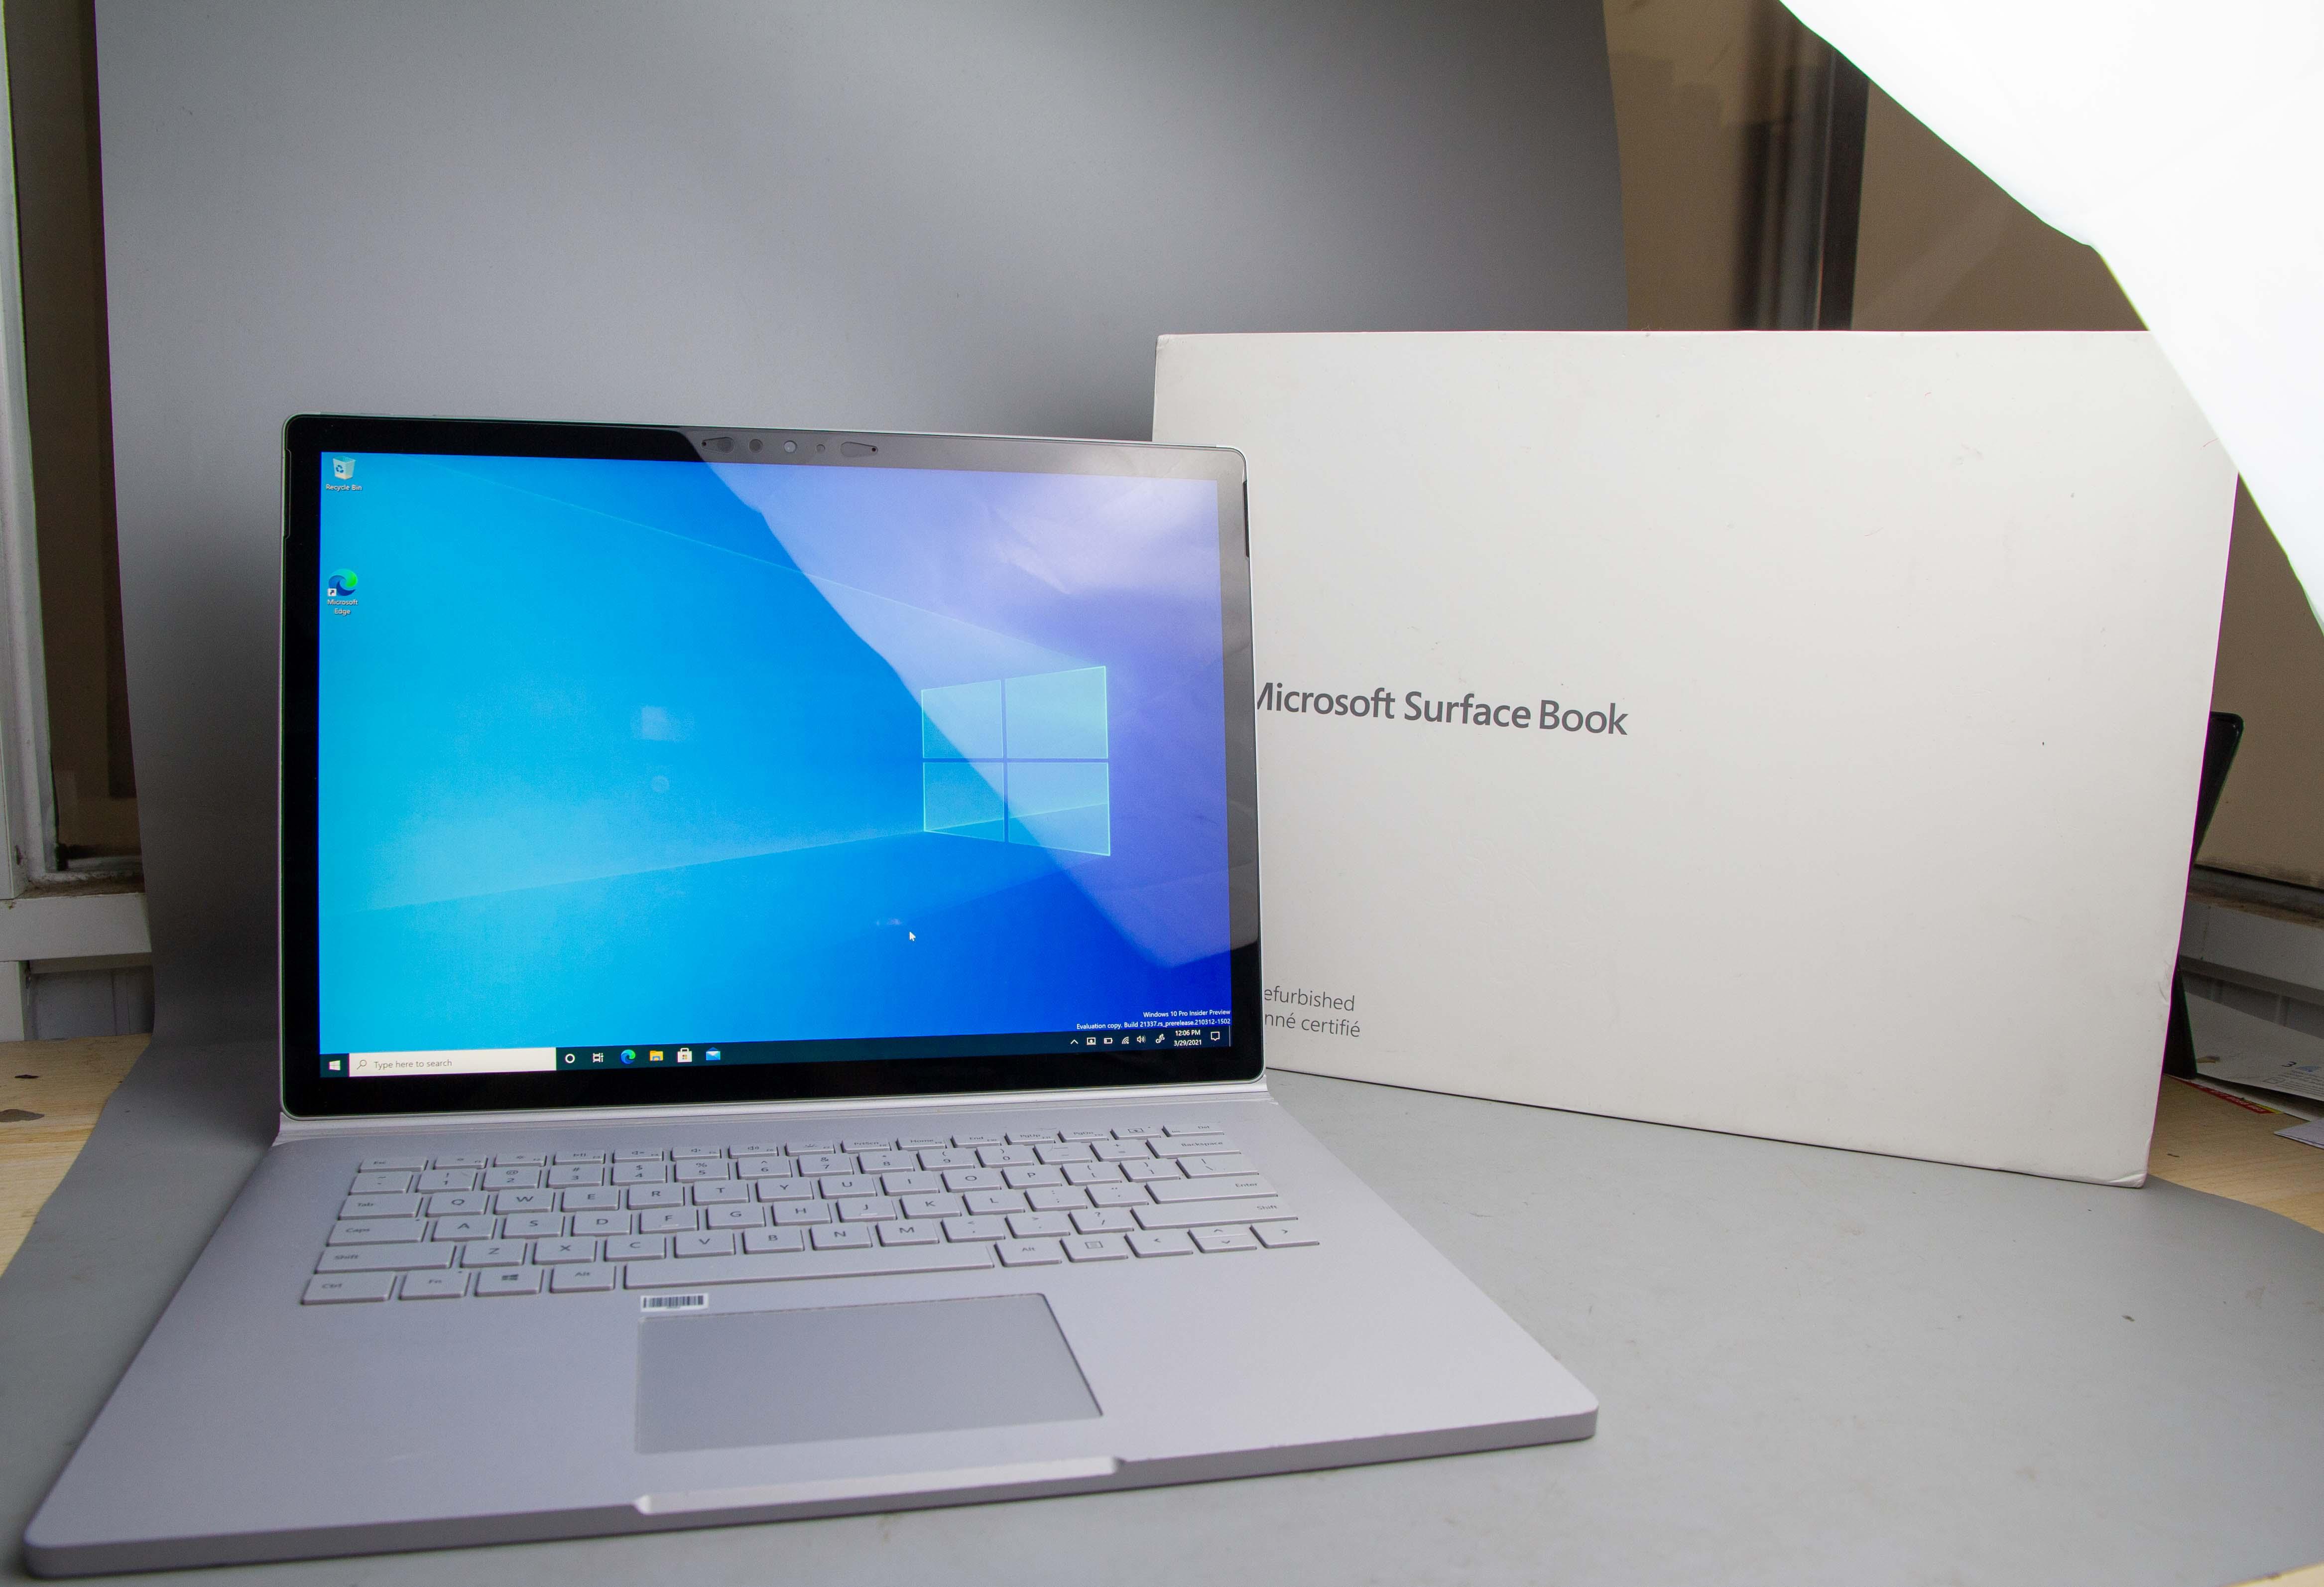 surface-book-2-15-ssd-256gb-core-i7-ram-16gb-gtx-1060-6gb-fb-15363